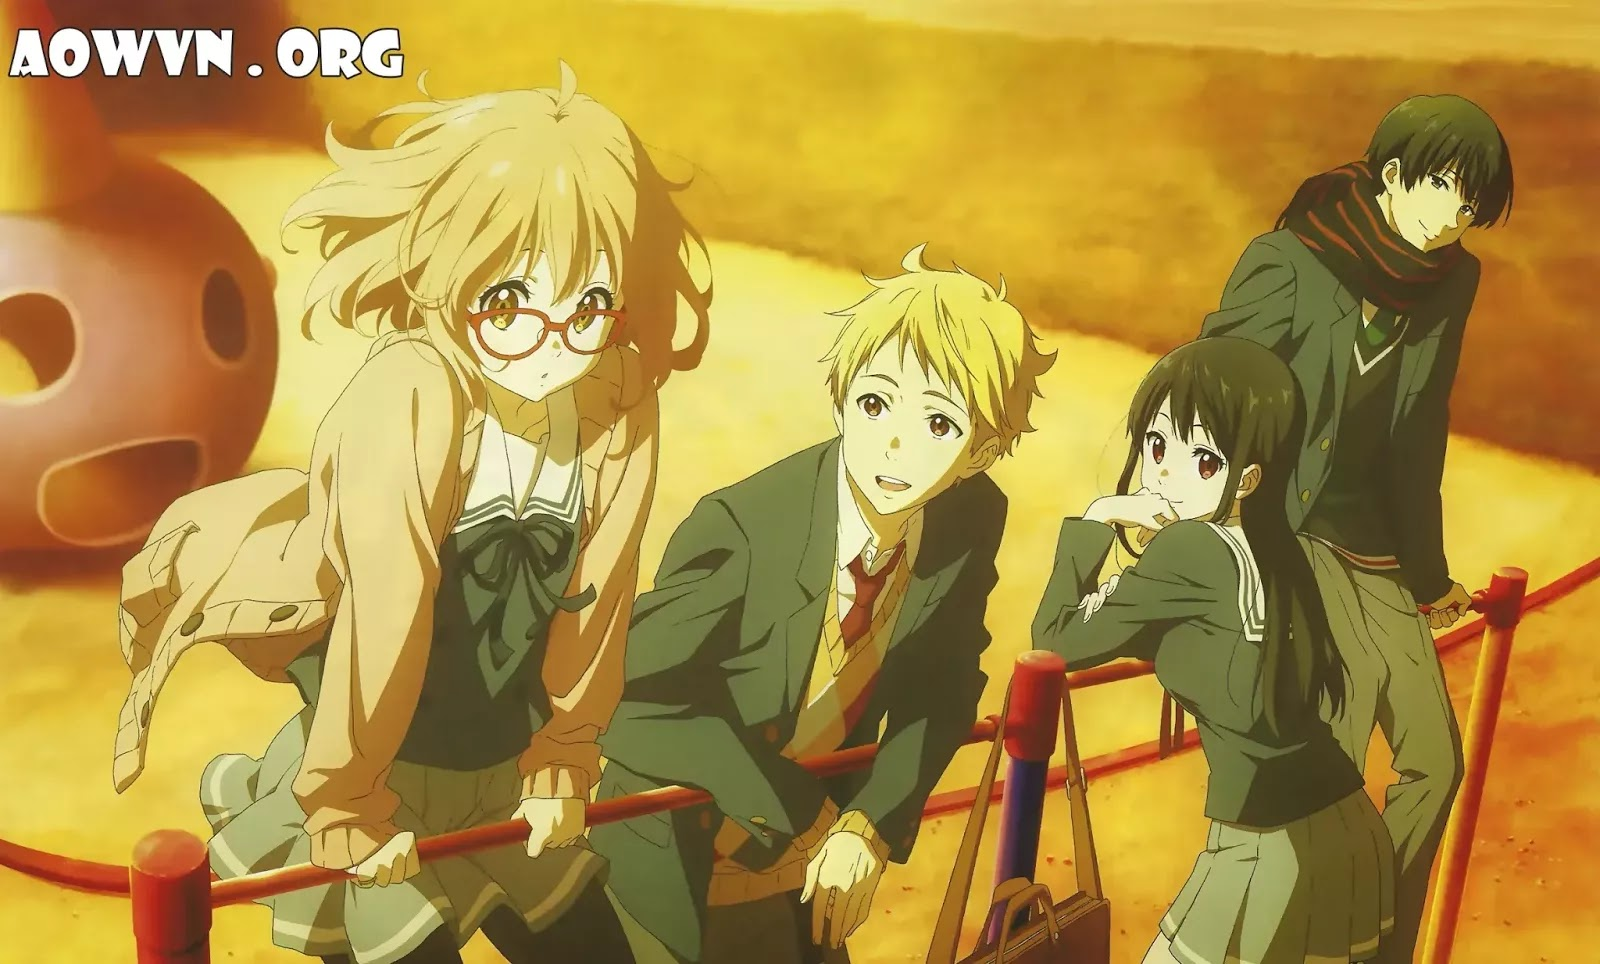 kyoukai aowvn - [ Anime 3gp ] Kyoukai No Katana + OVA + Movie | Vietsub - Siêu Phẩm Là Đây